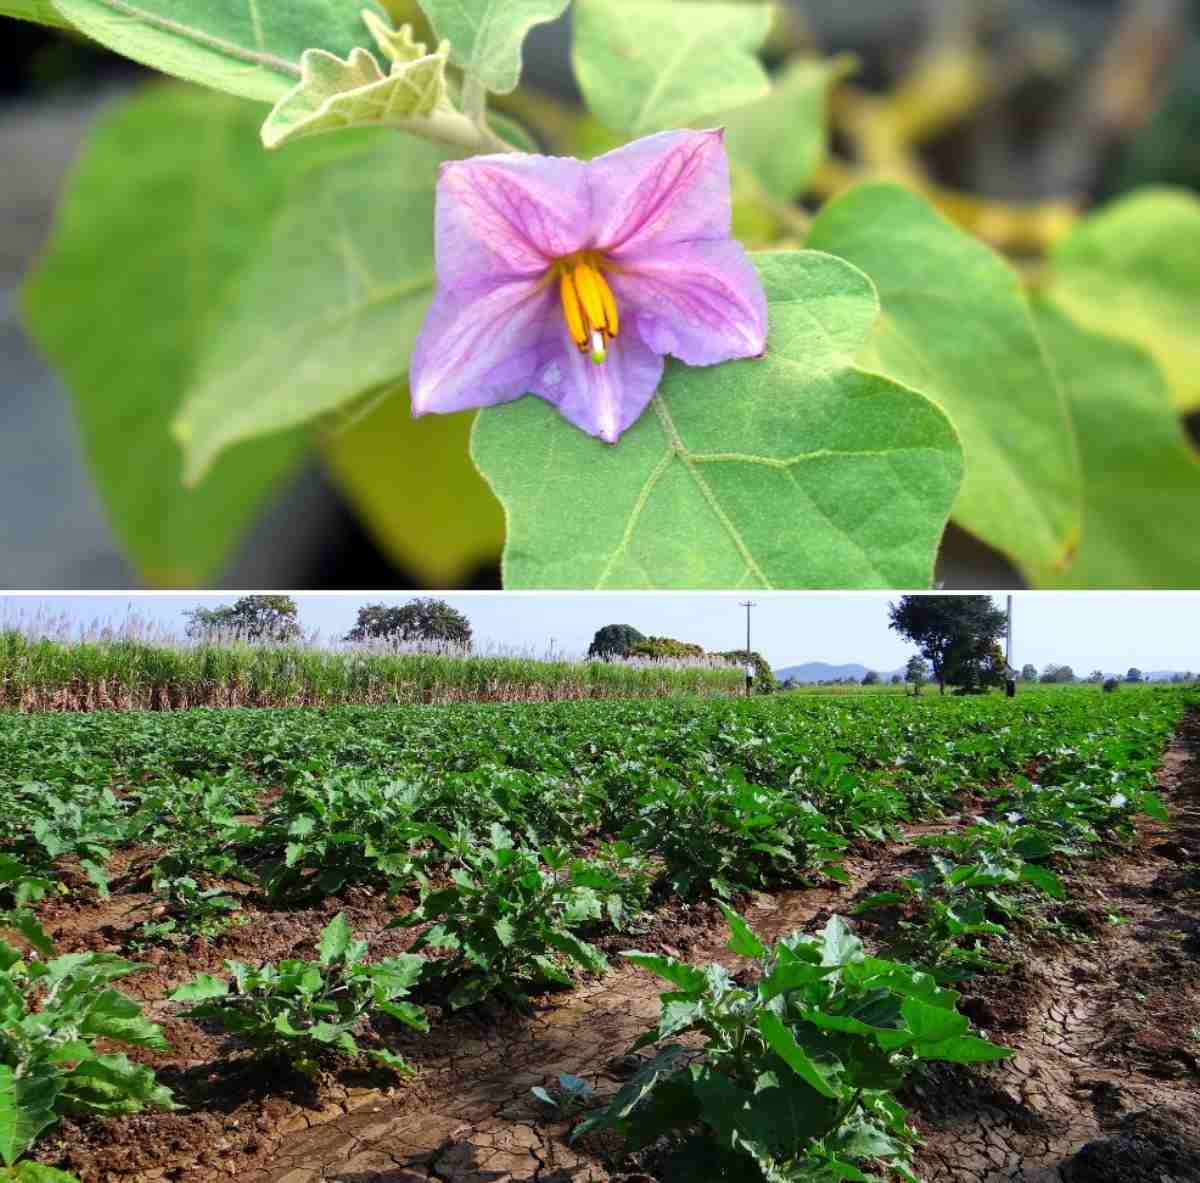 Common questions about Eggplant flower drop.